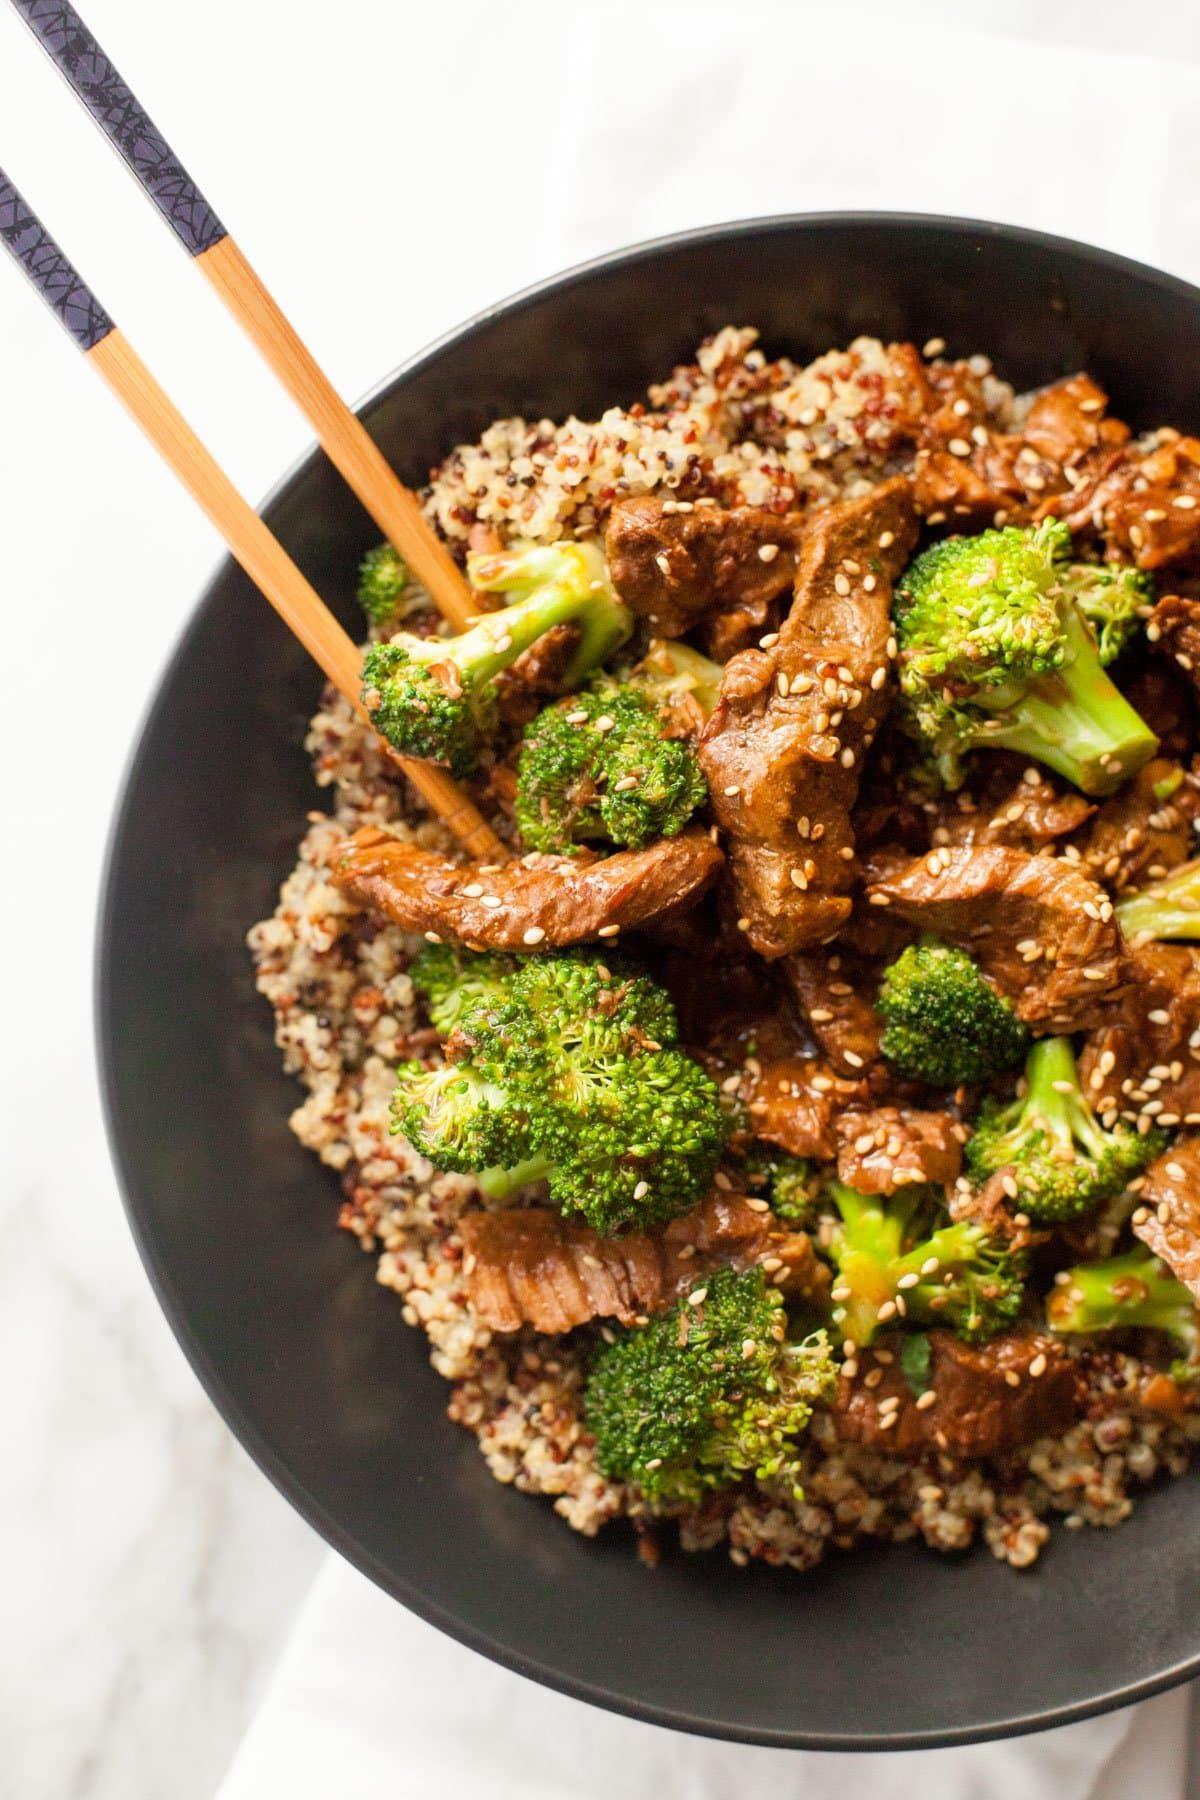 Slow Cooker Beef and Broccoli with Quinoa #beefandbroccoli